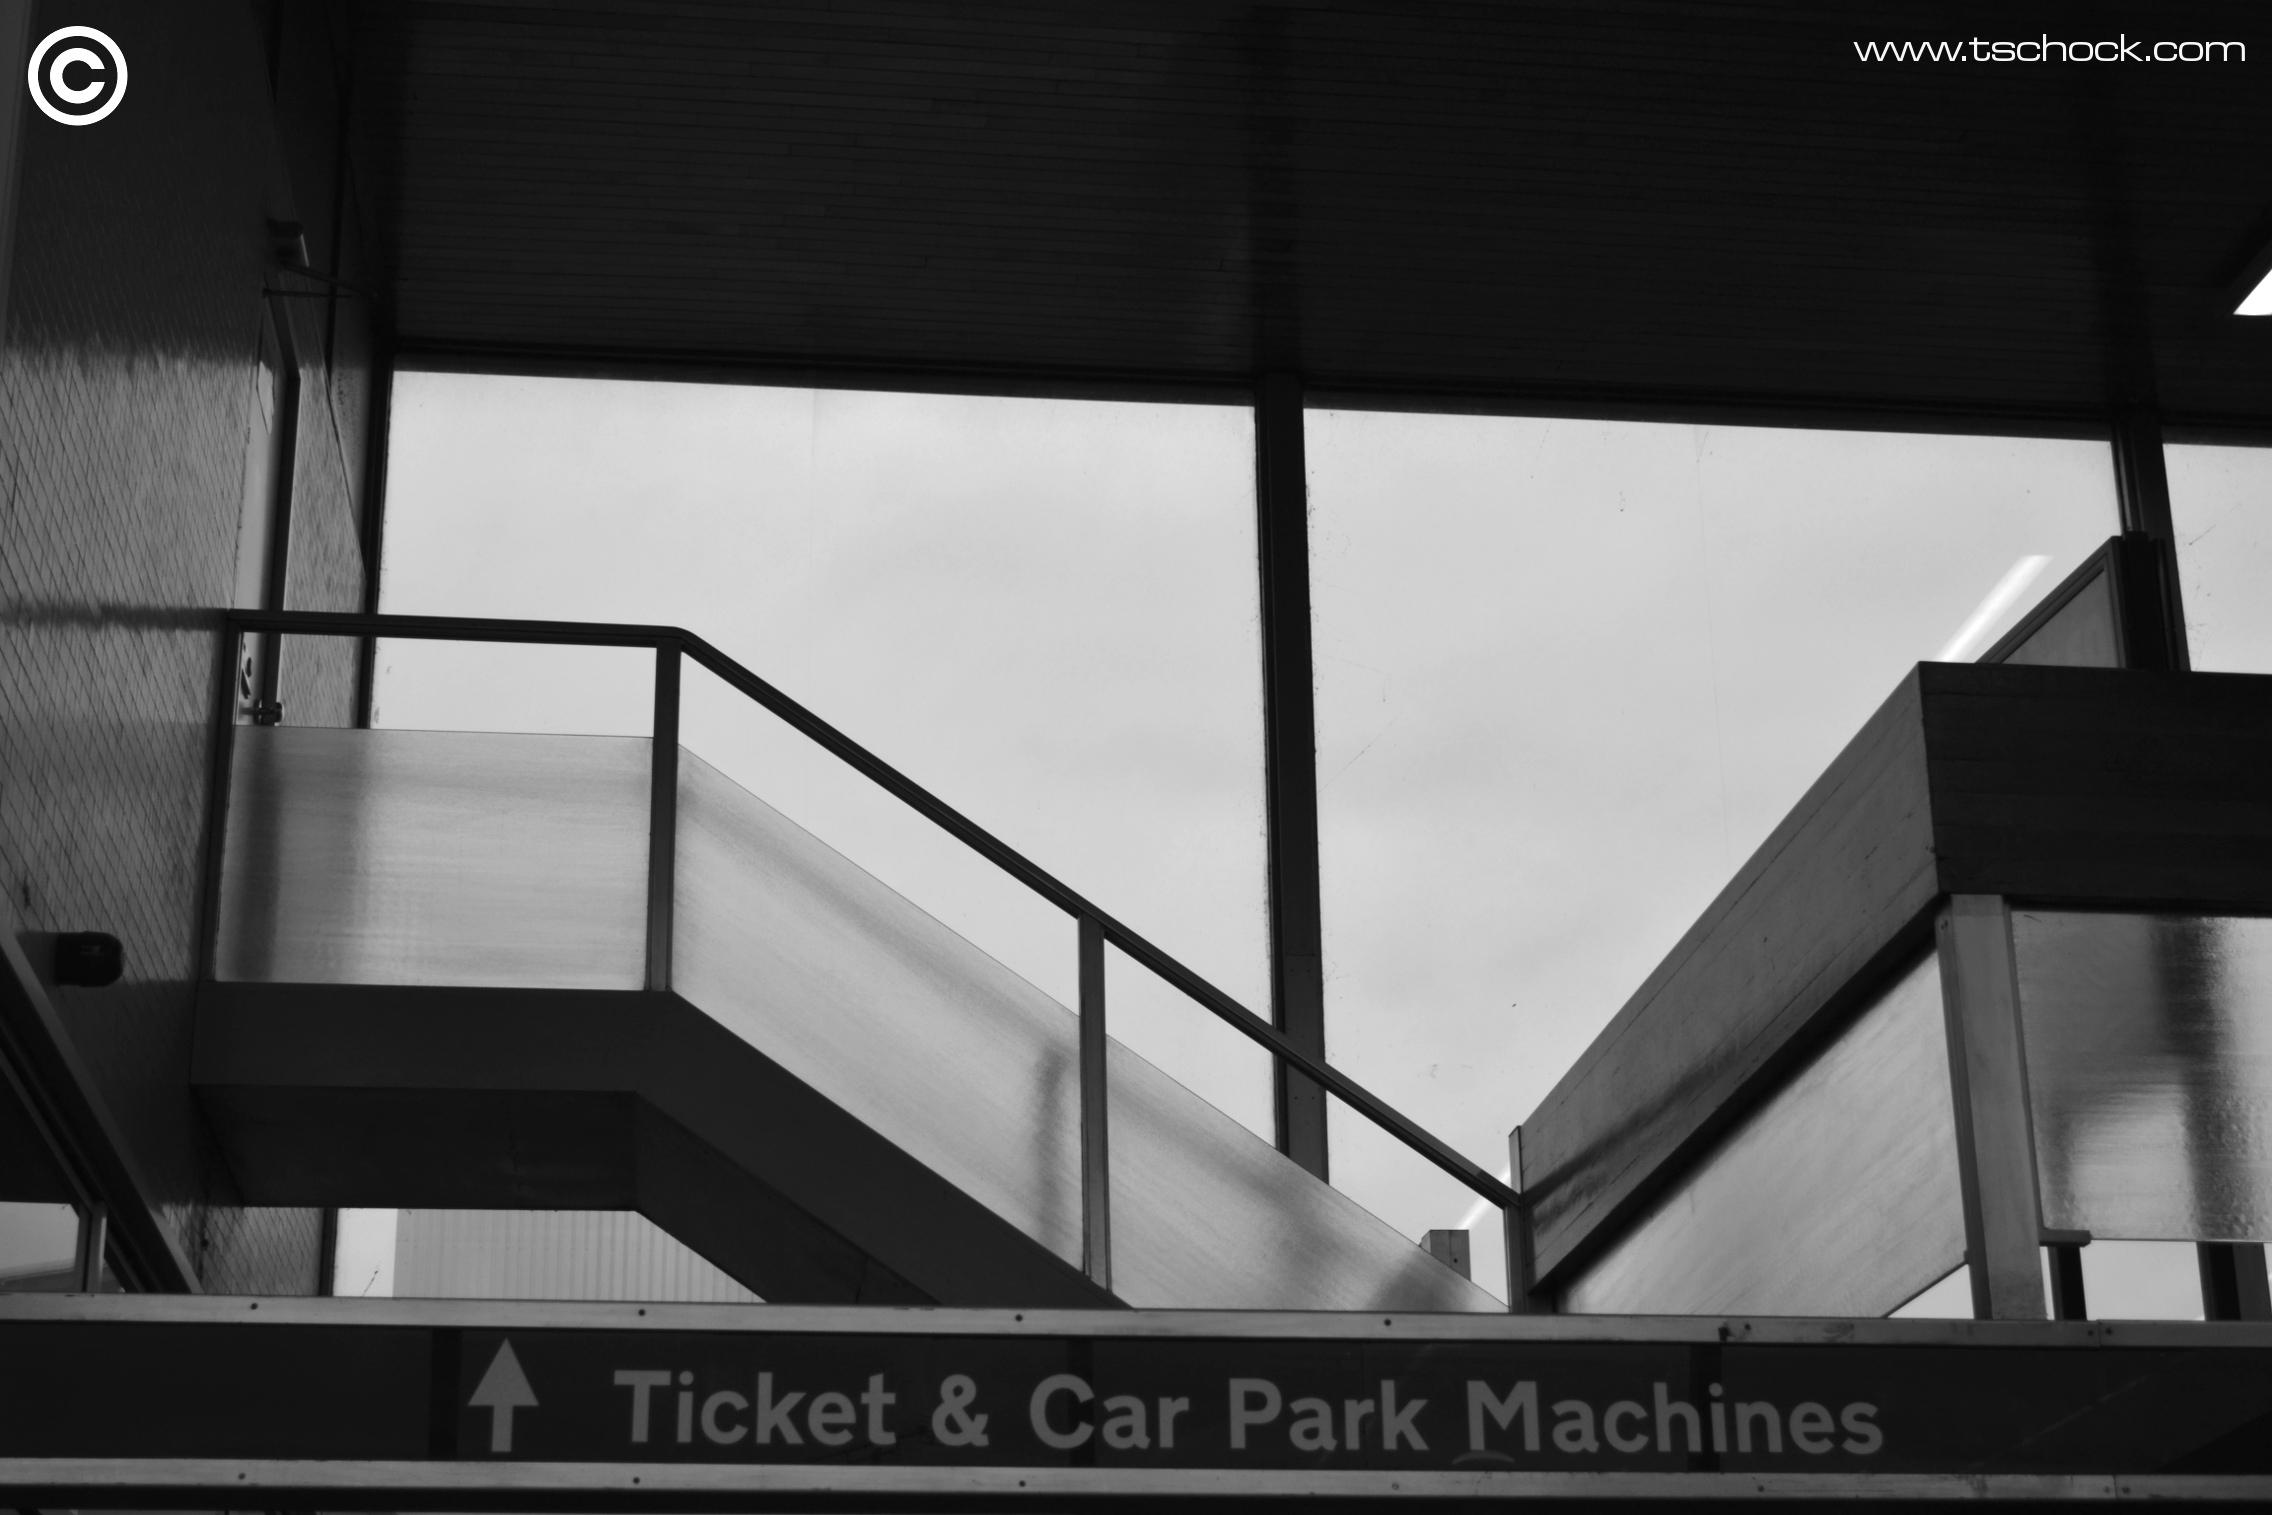 Carpark and machines